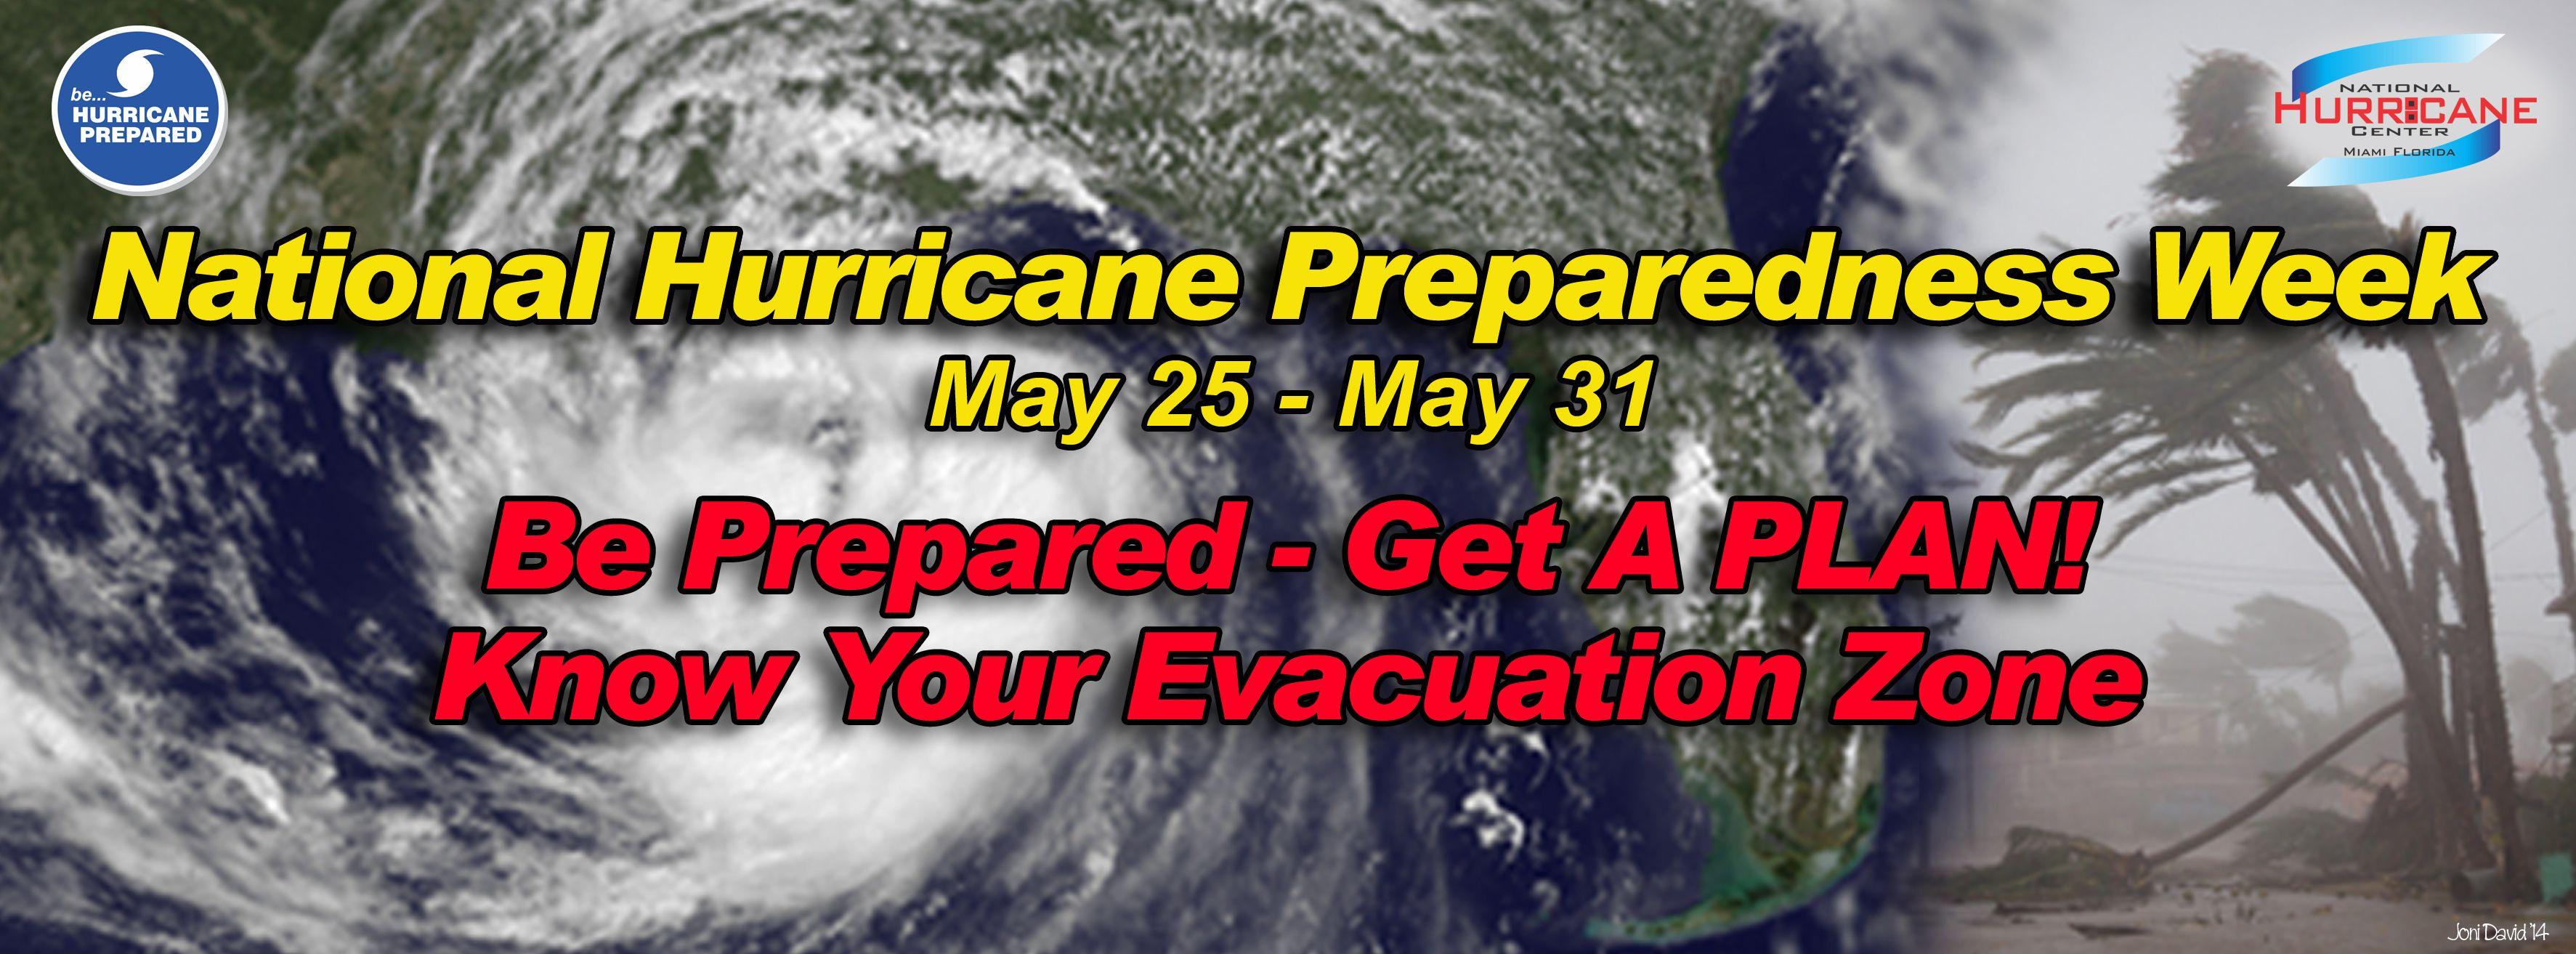 National Hurricane Preparedness Week 2014 Emergency Water And Smoke Removal Blog Atlanta Fire Wa Hurricane Preparedness Preparedness Disaster Preparedness